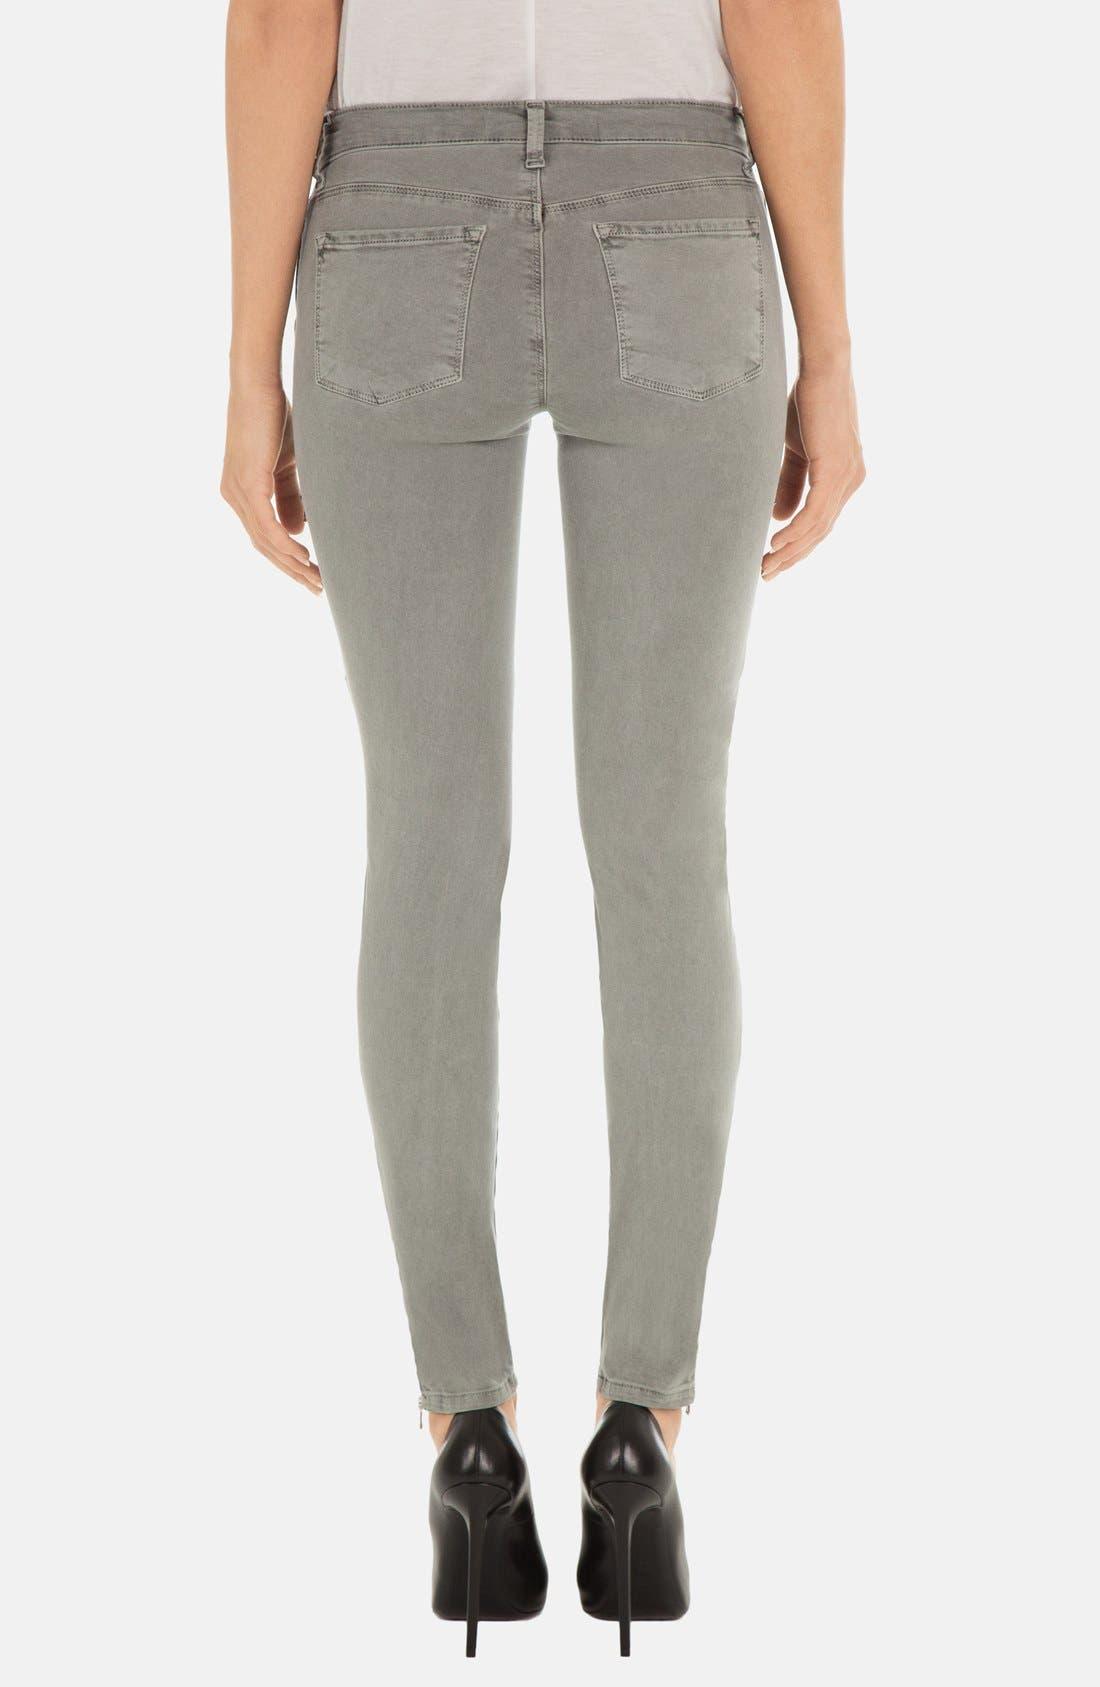 Alternate Image 2  - J Brand 'Kassidy' Skinny Jeans (Vintage Olive)